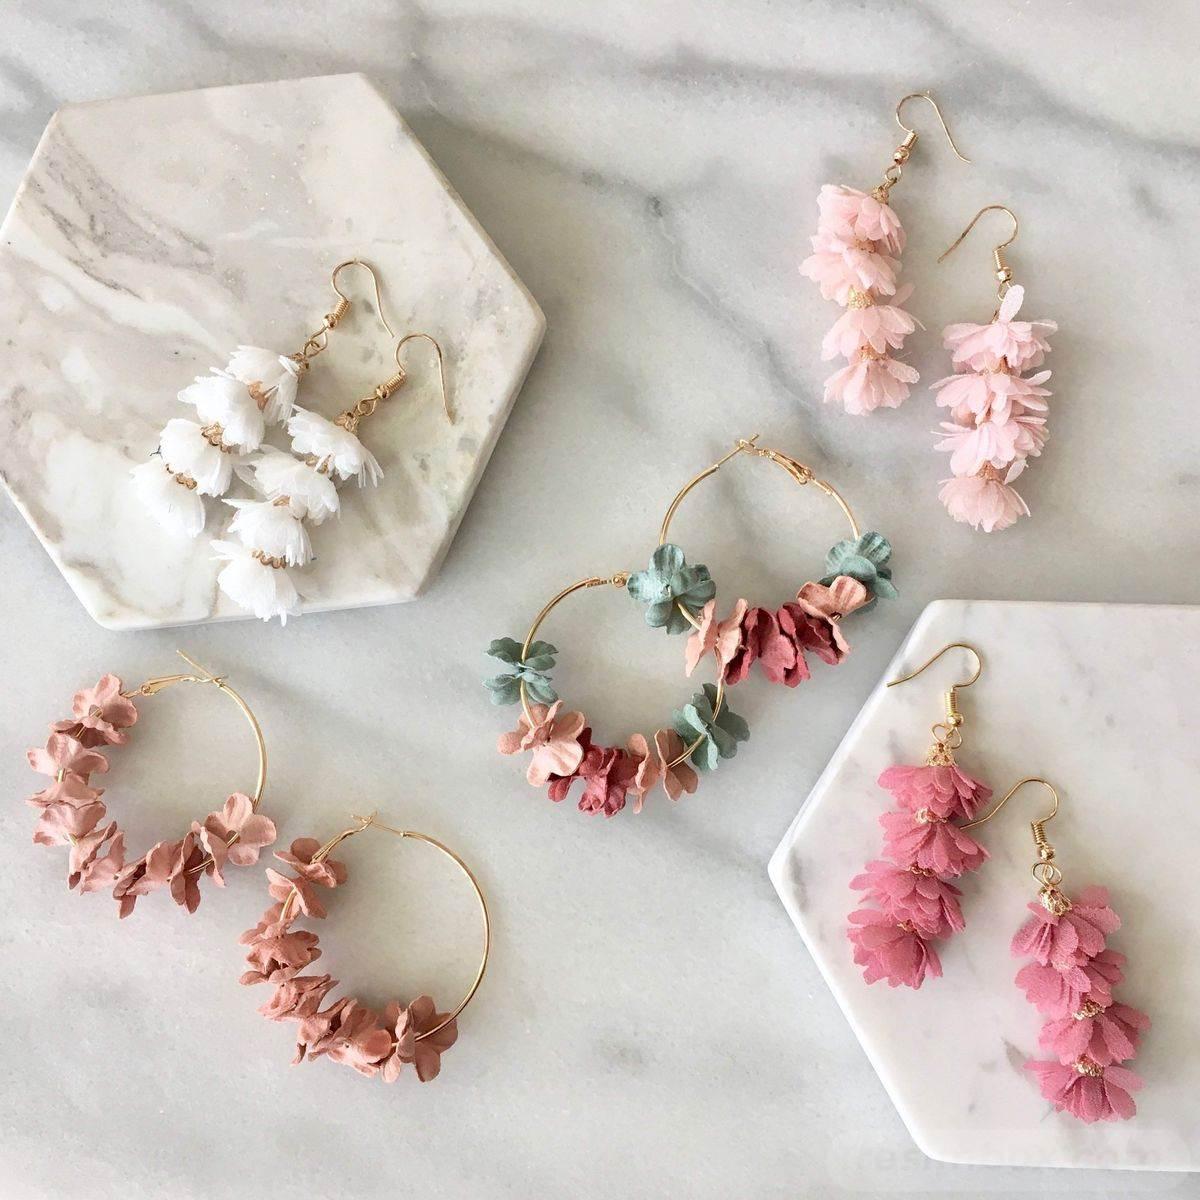 beautiful jewelry diy-747808713109051839